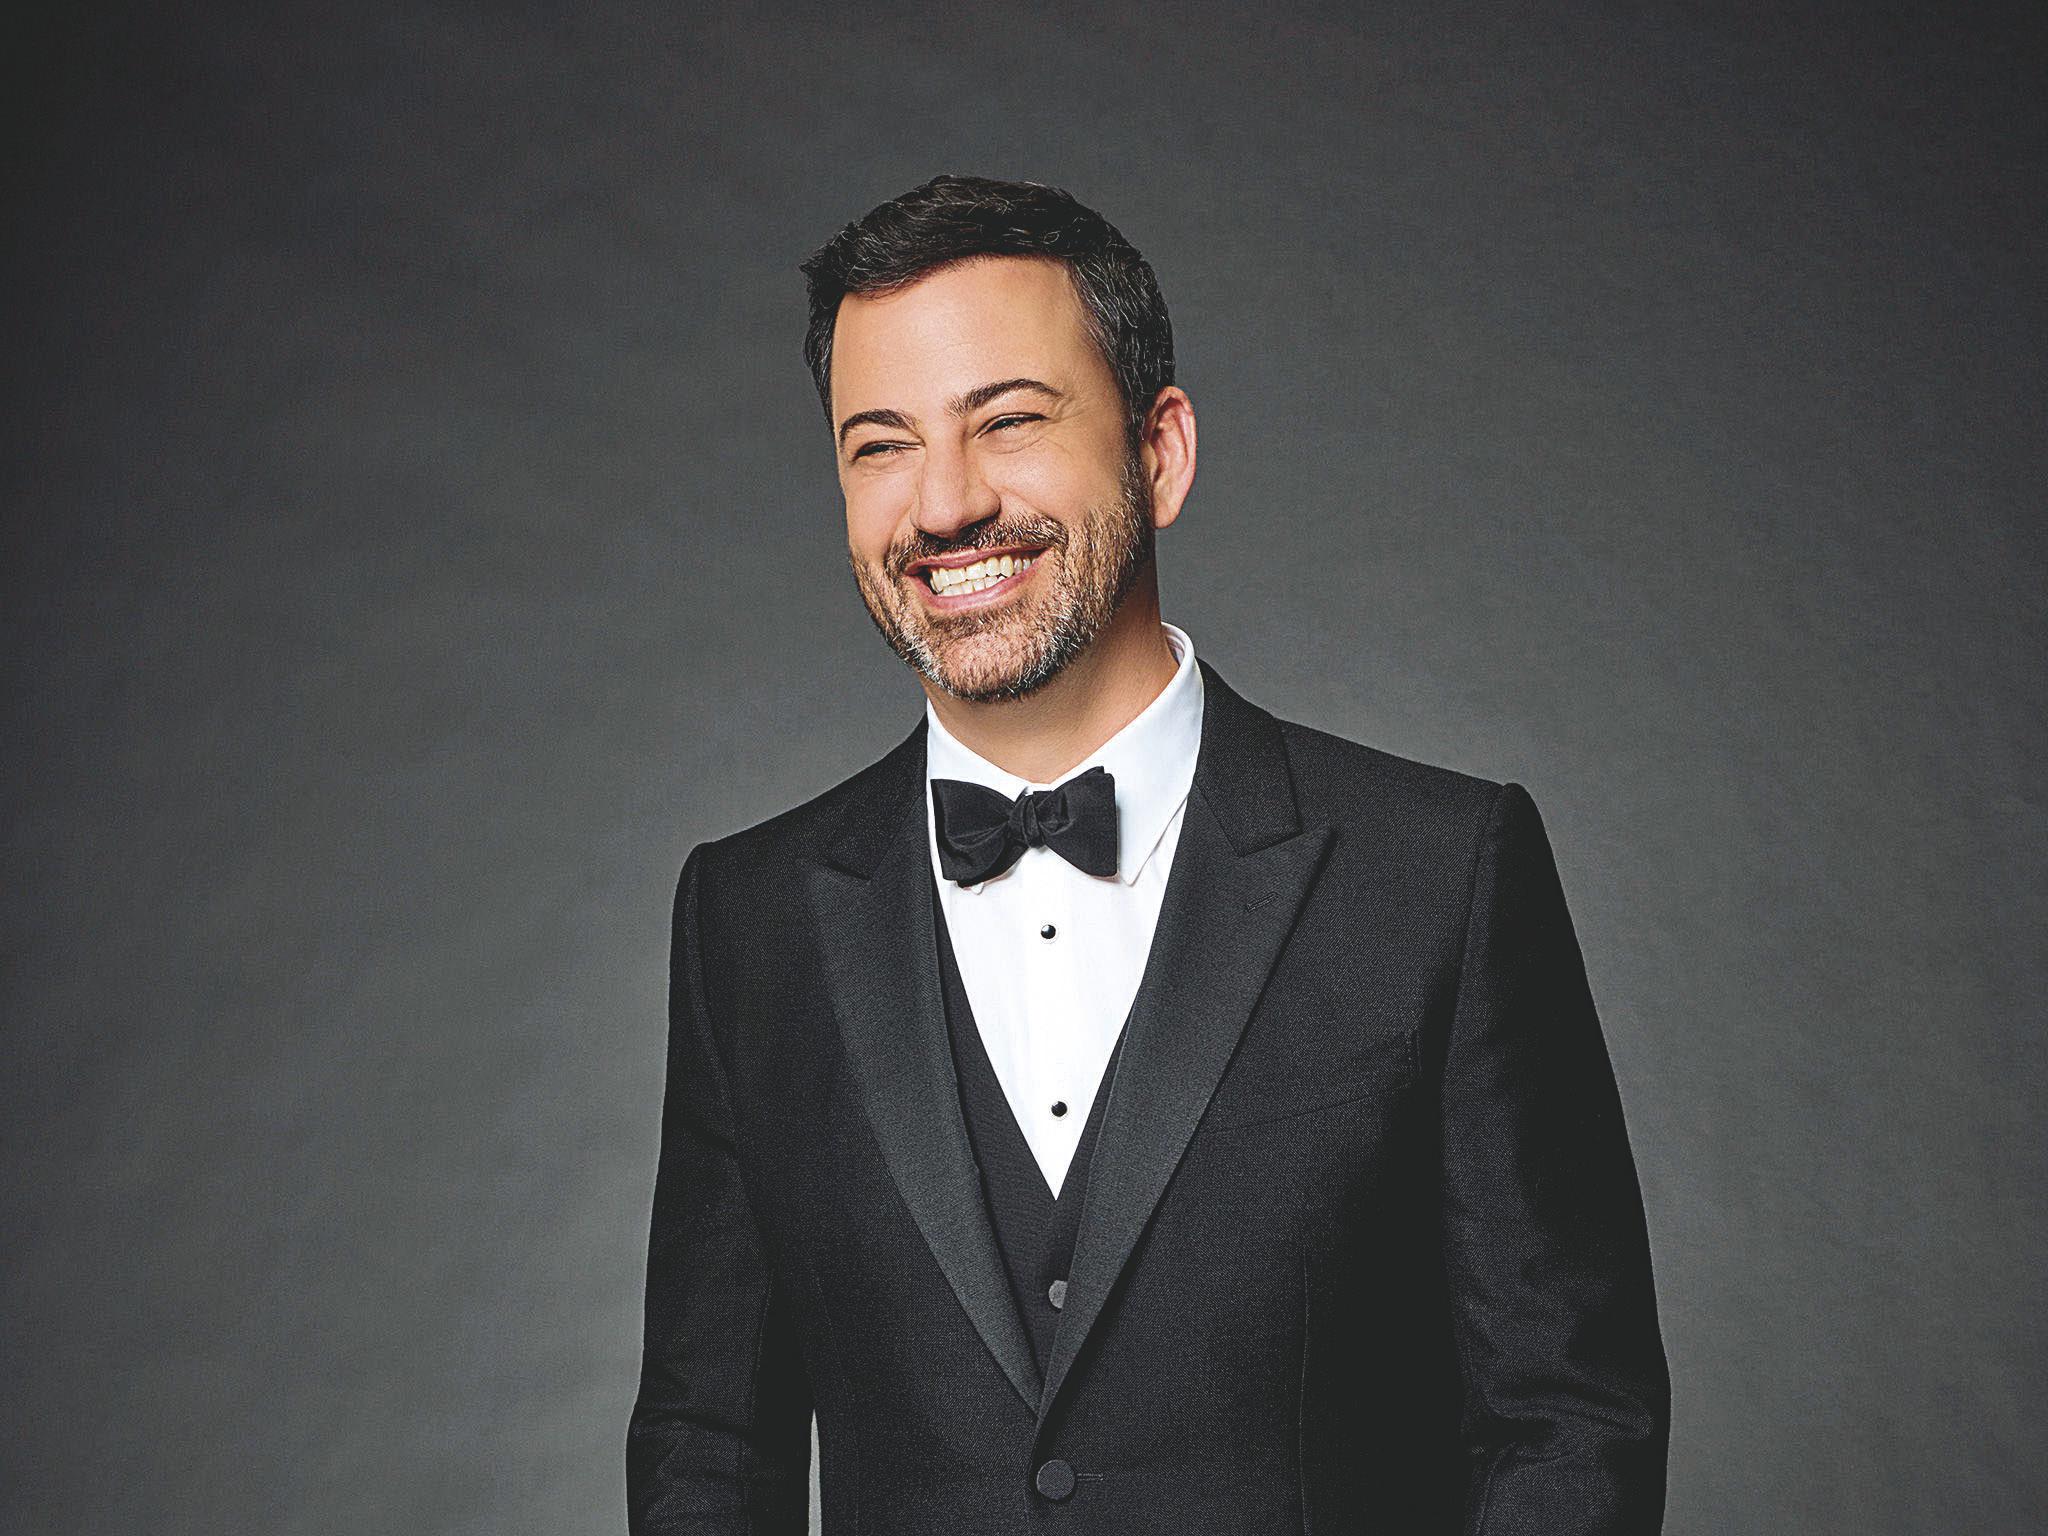 Os 5 melhores vídeos de Jimmy Kimmel